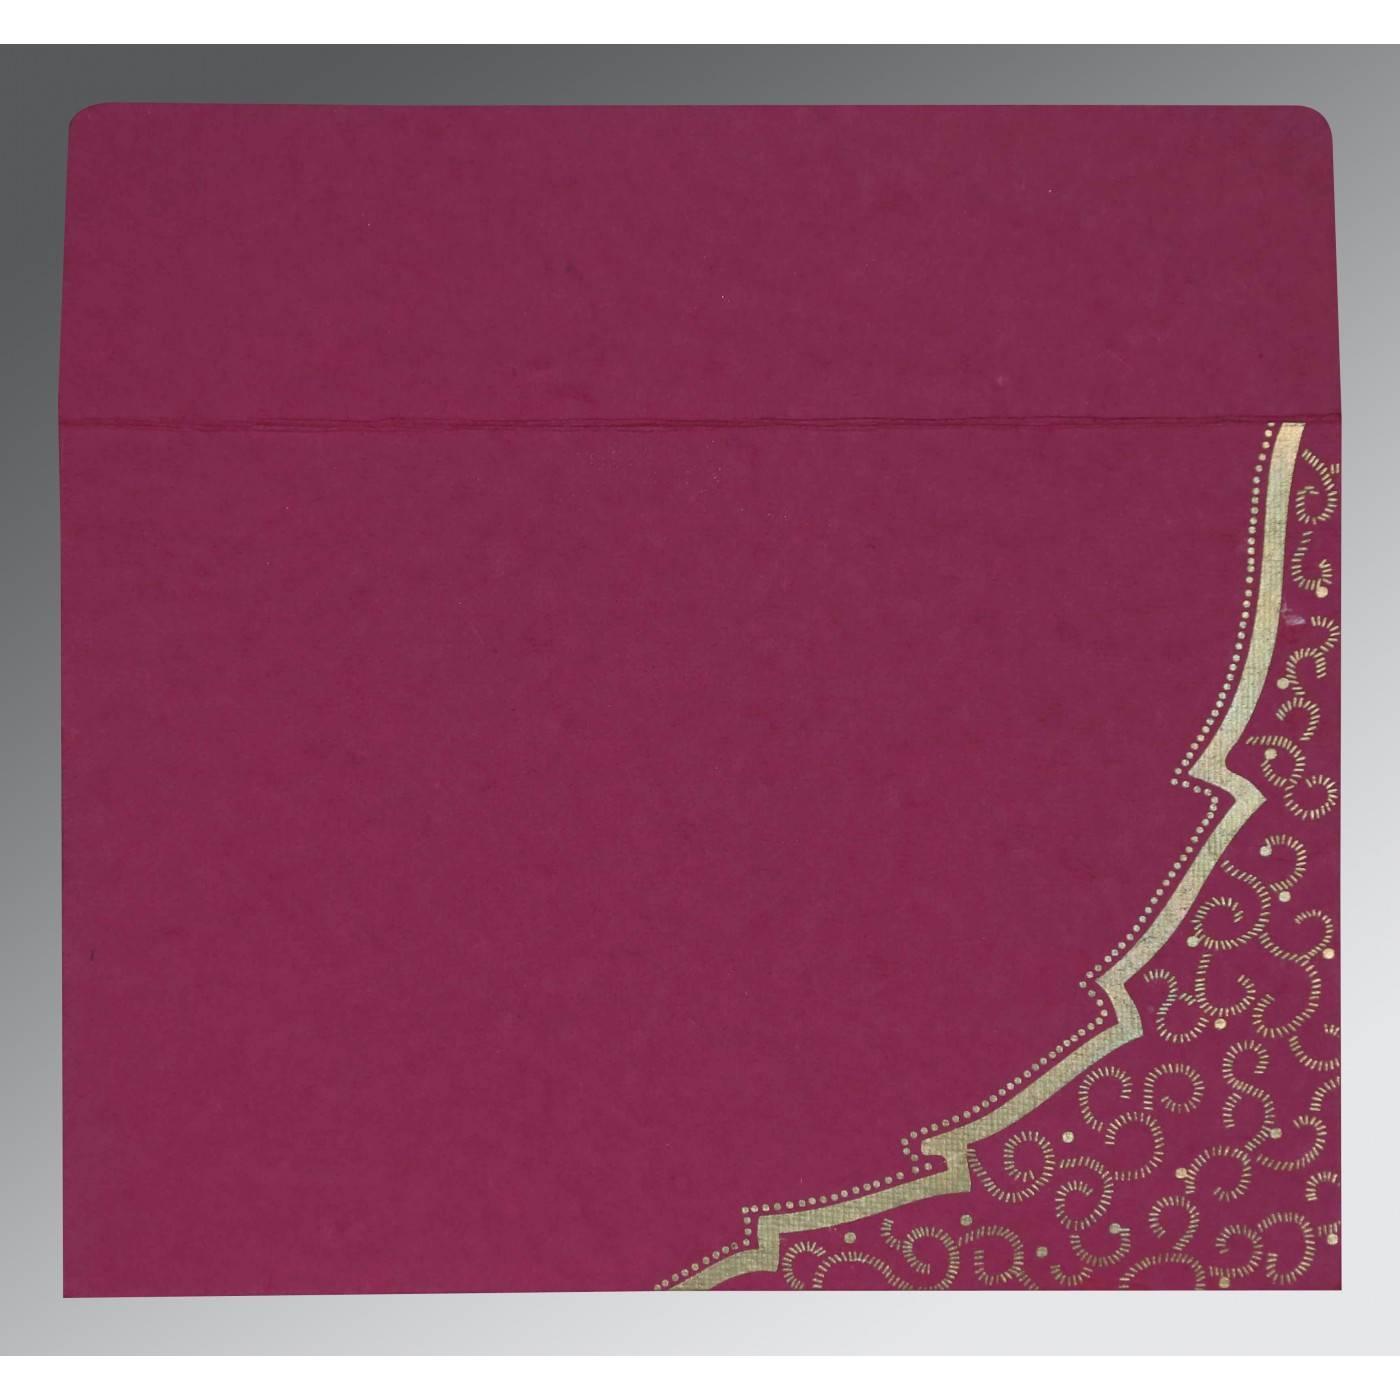 HOT PINK TRANSPARENT HANDMADE COTTON FLORAL THEMED - FOIL STAMPED WEDDING CARD : CD-8219F - IndianWeddingCards